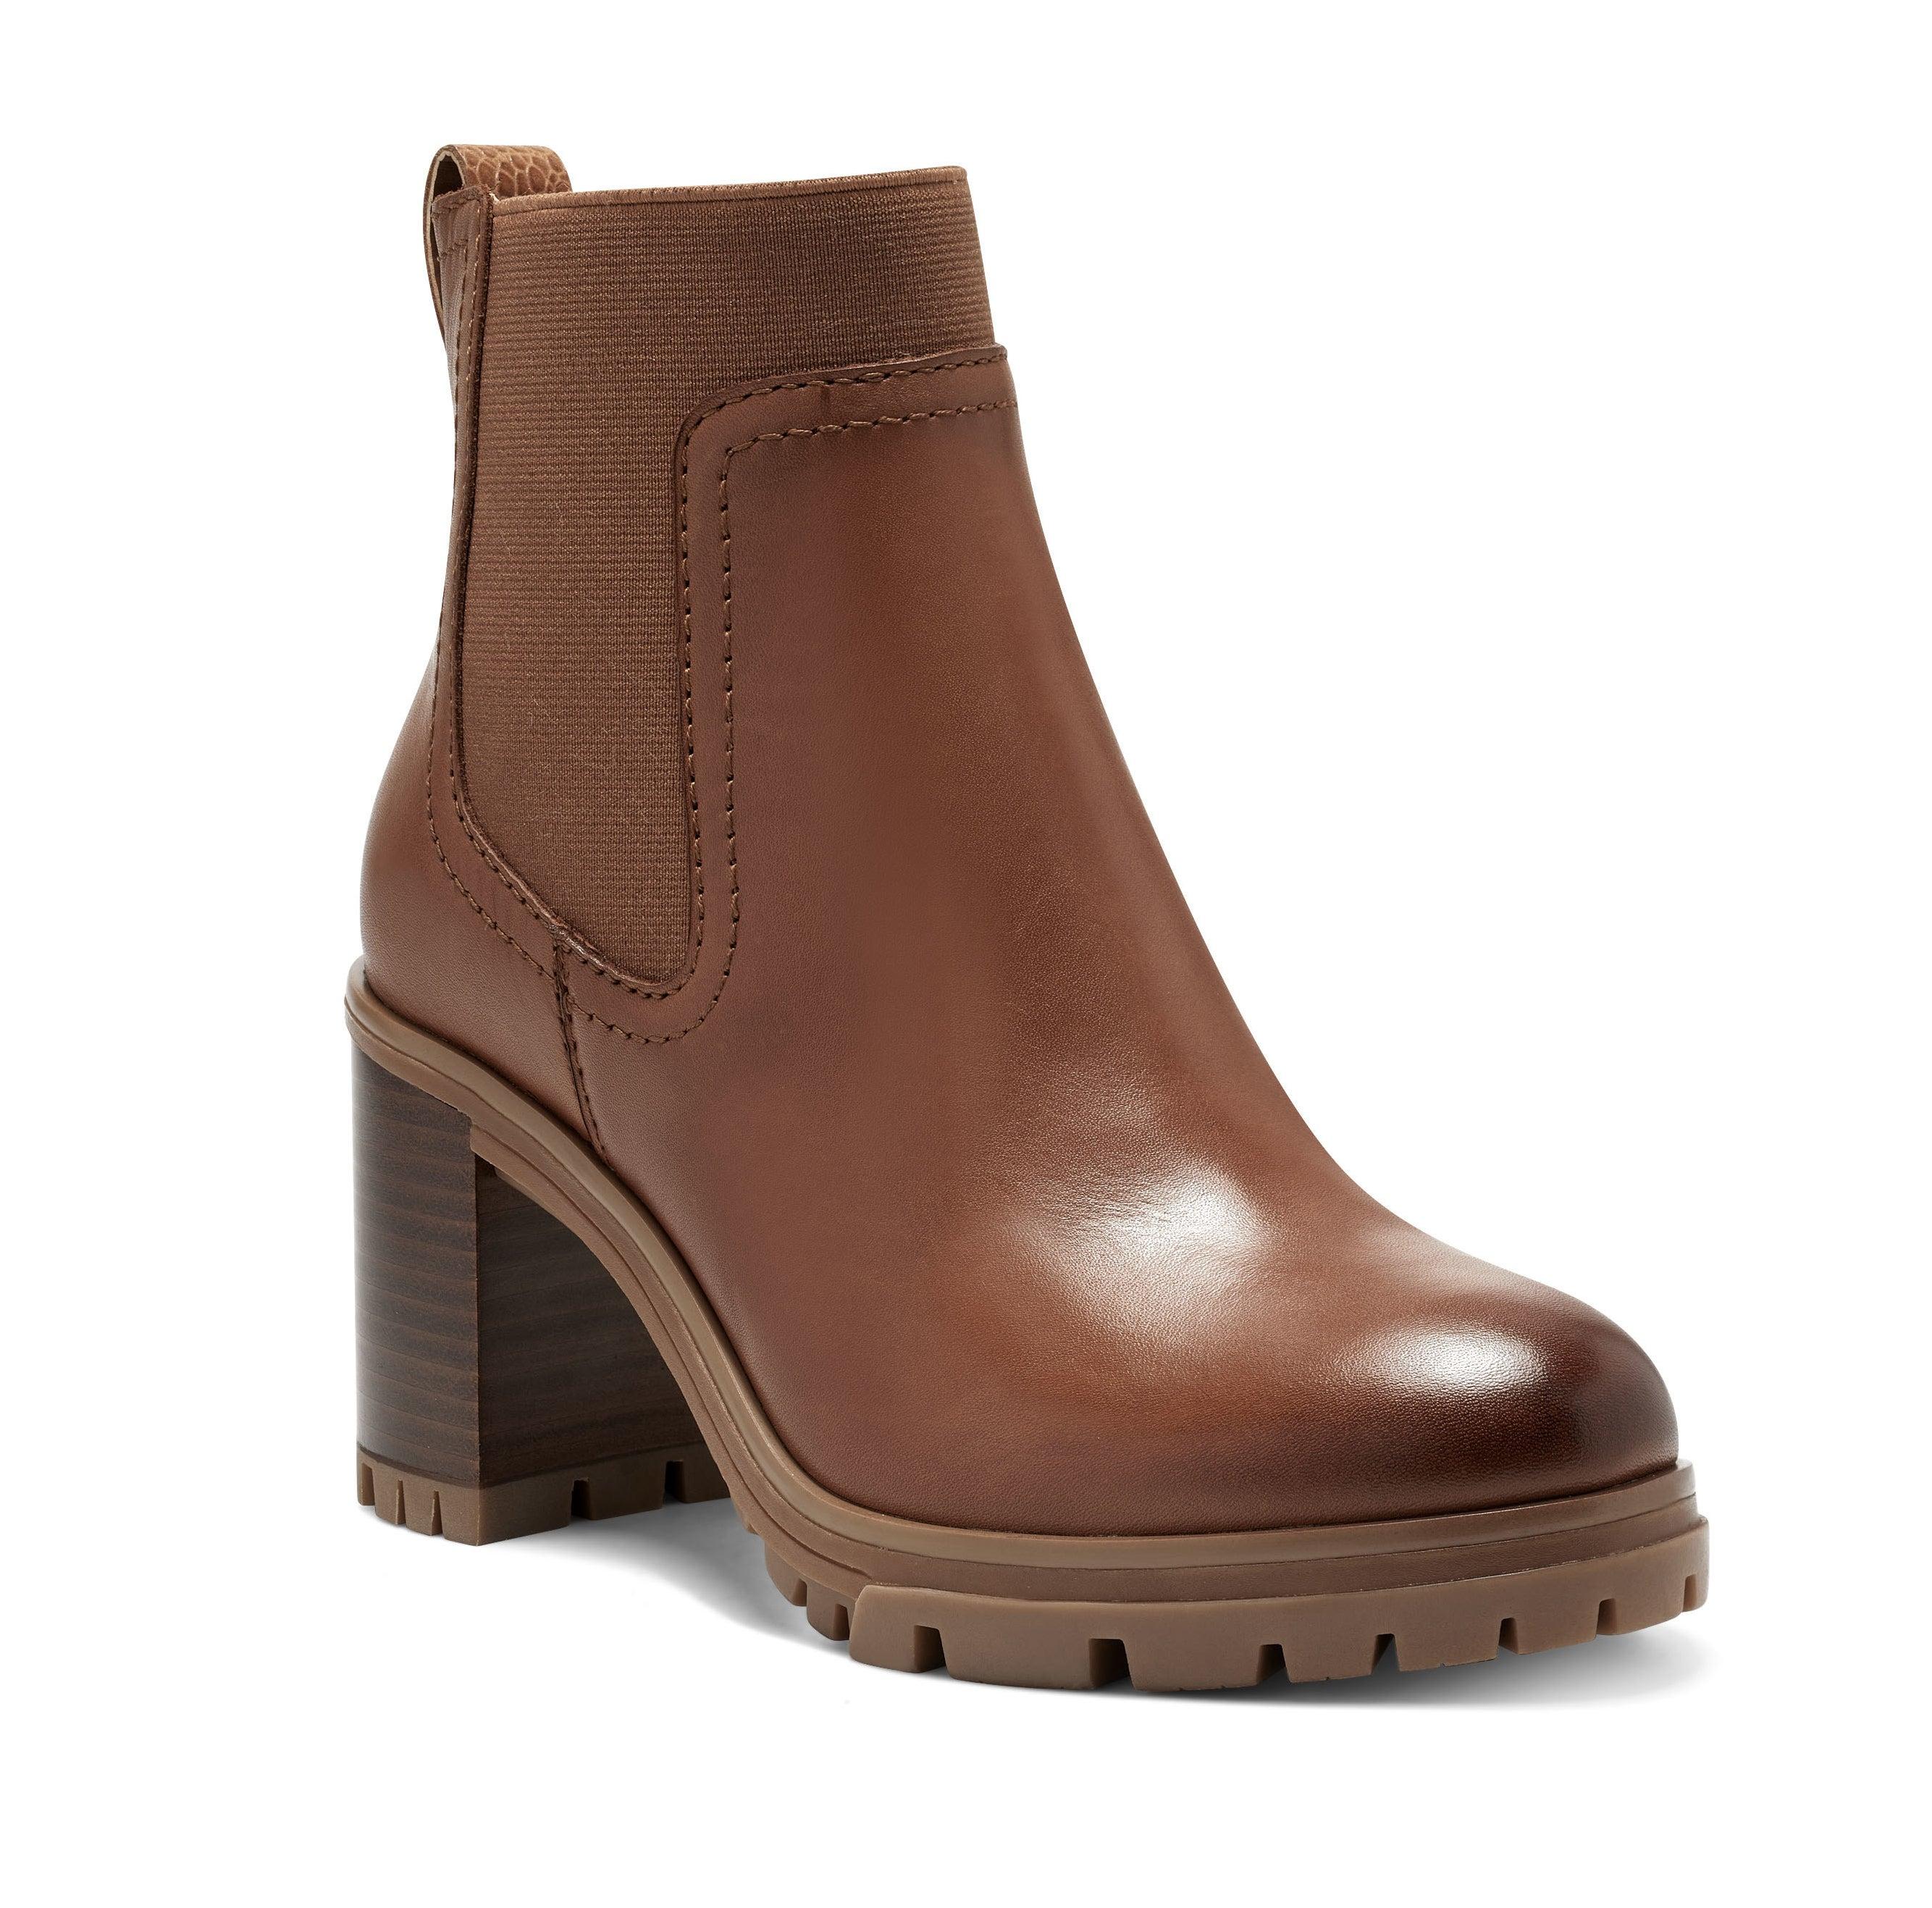 the brown platform boots